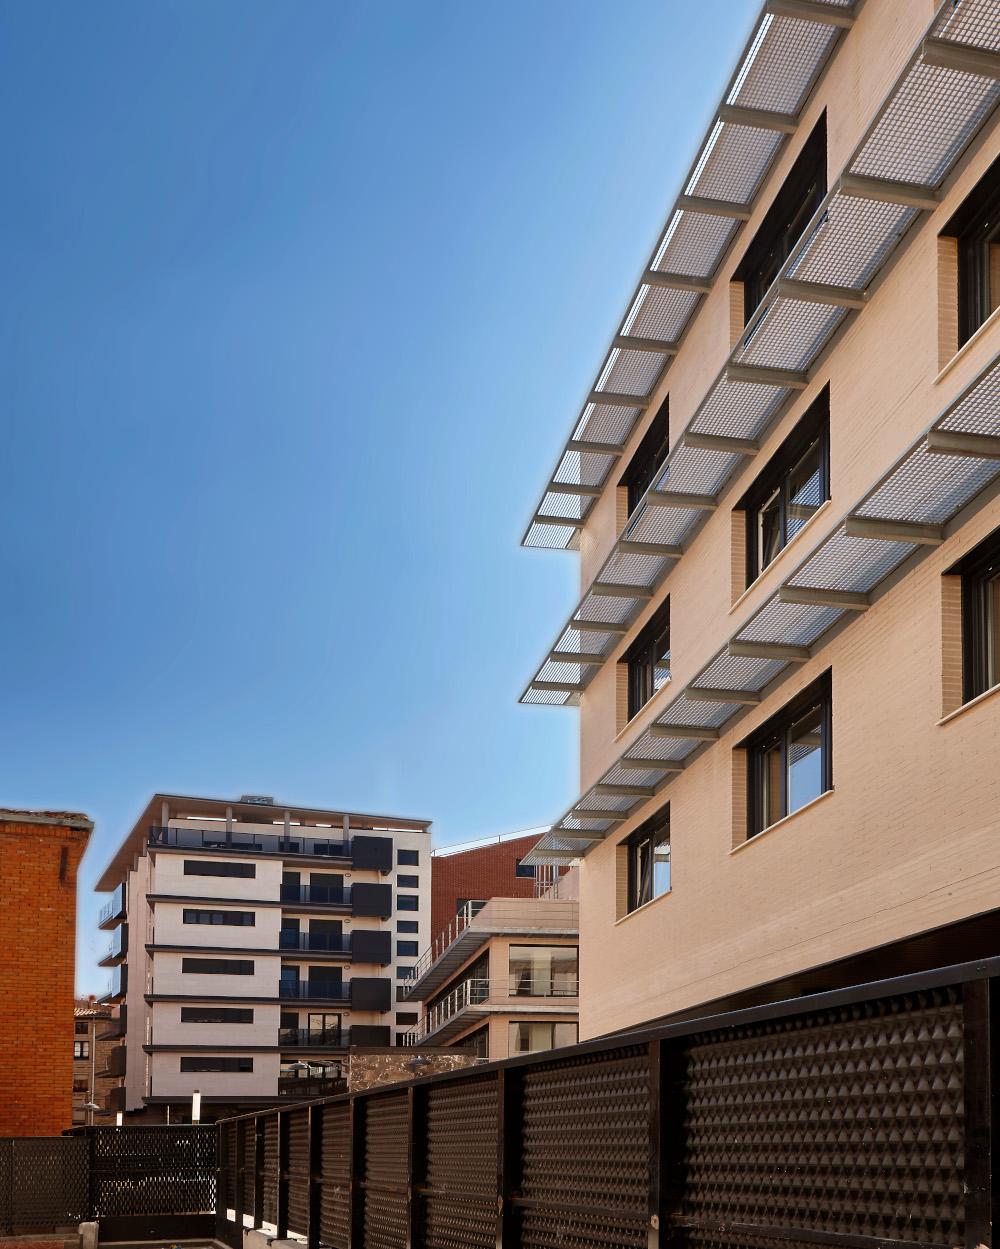 Comprar piso en Miranda de Ebro